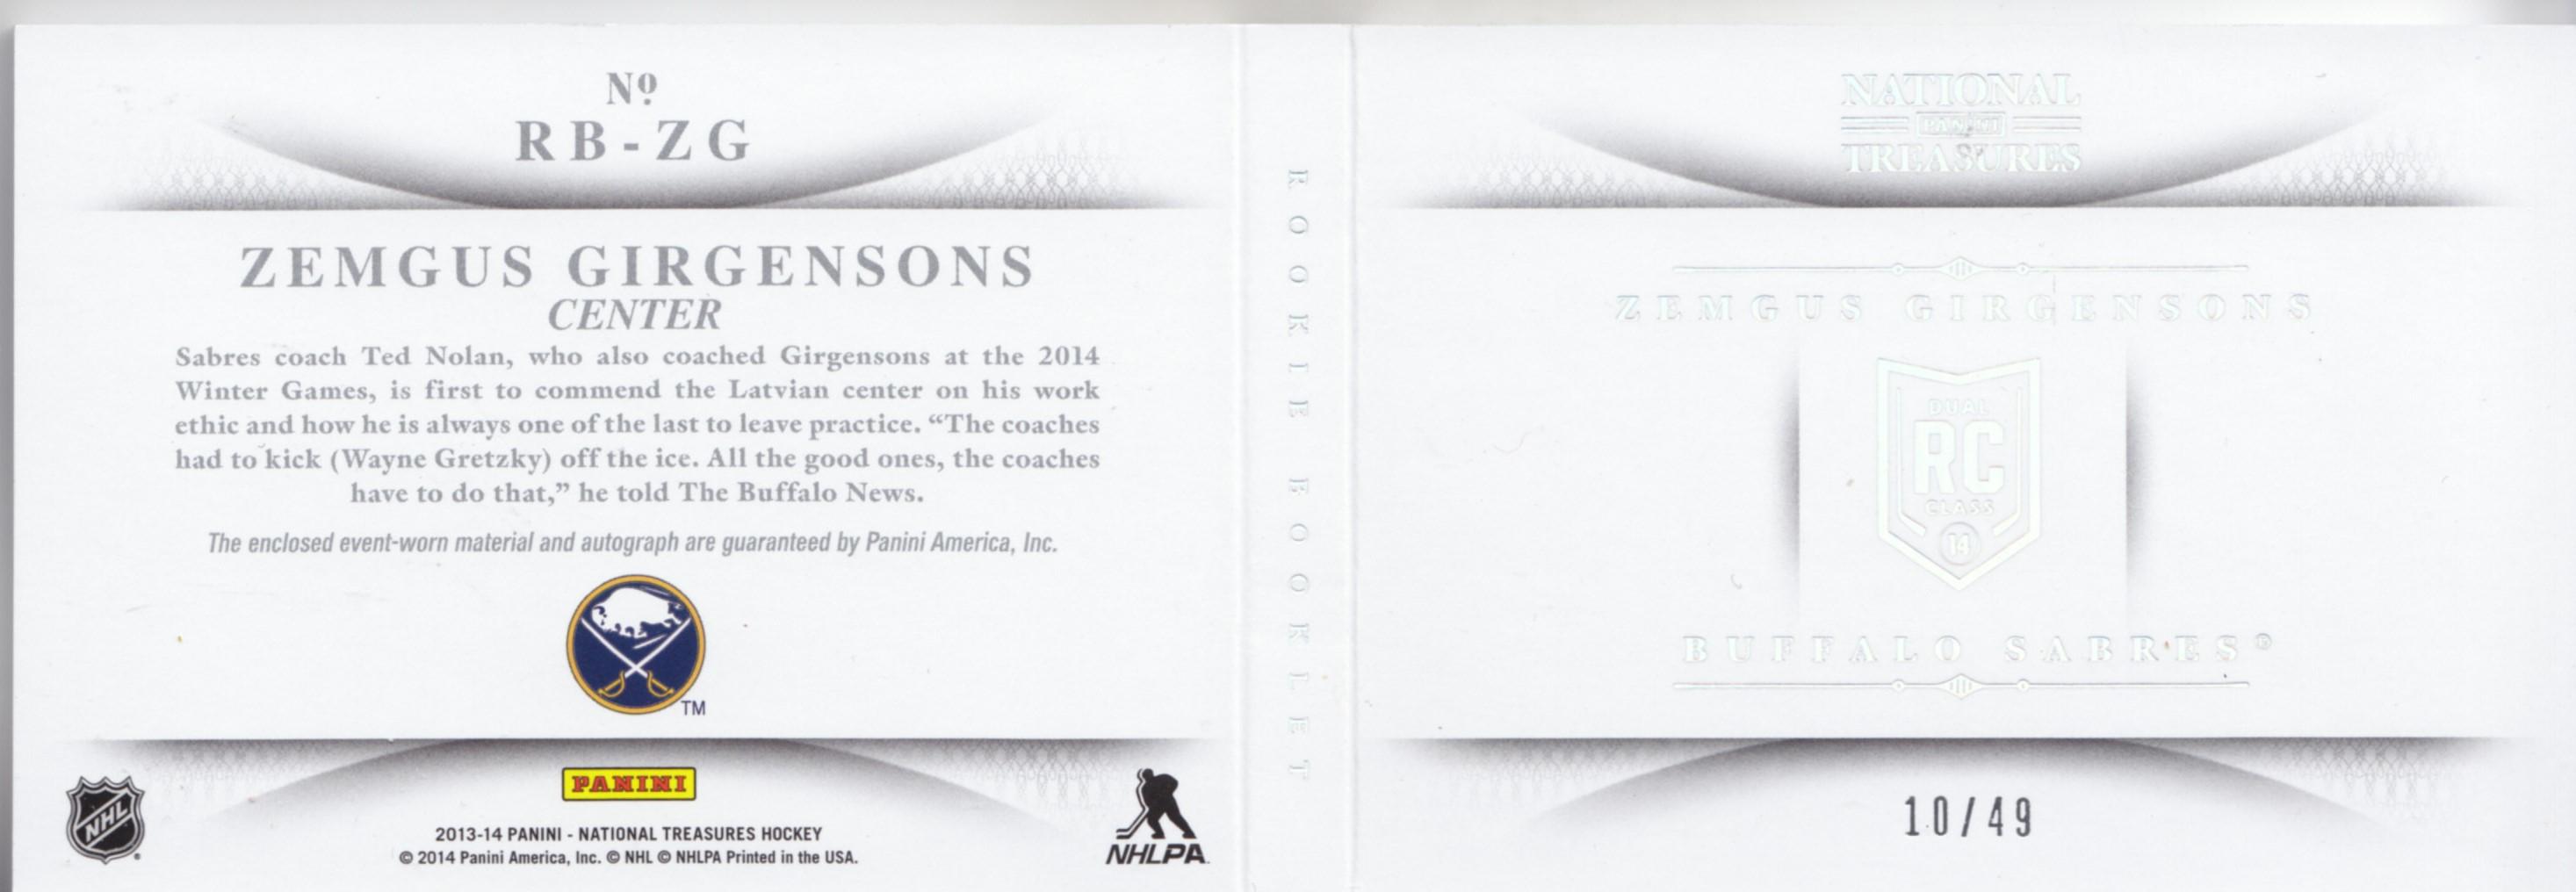 2013-14 Panini National Treasures Rookie Jumbo Jerseys Booklet Autographs Prime #18 Zemgus Girgensons back image